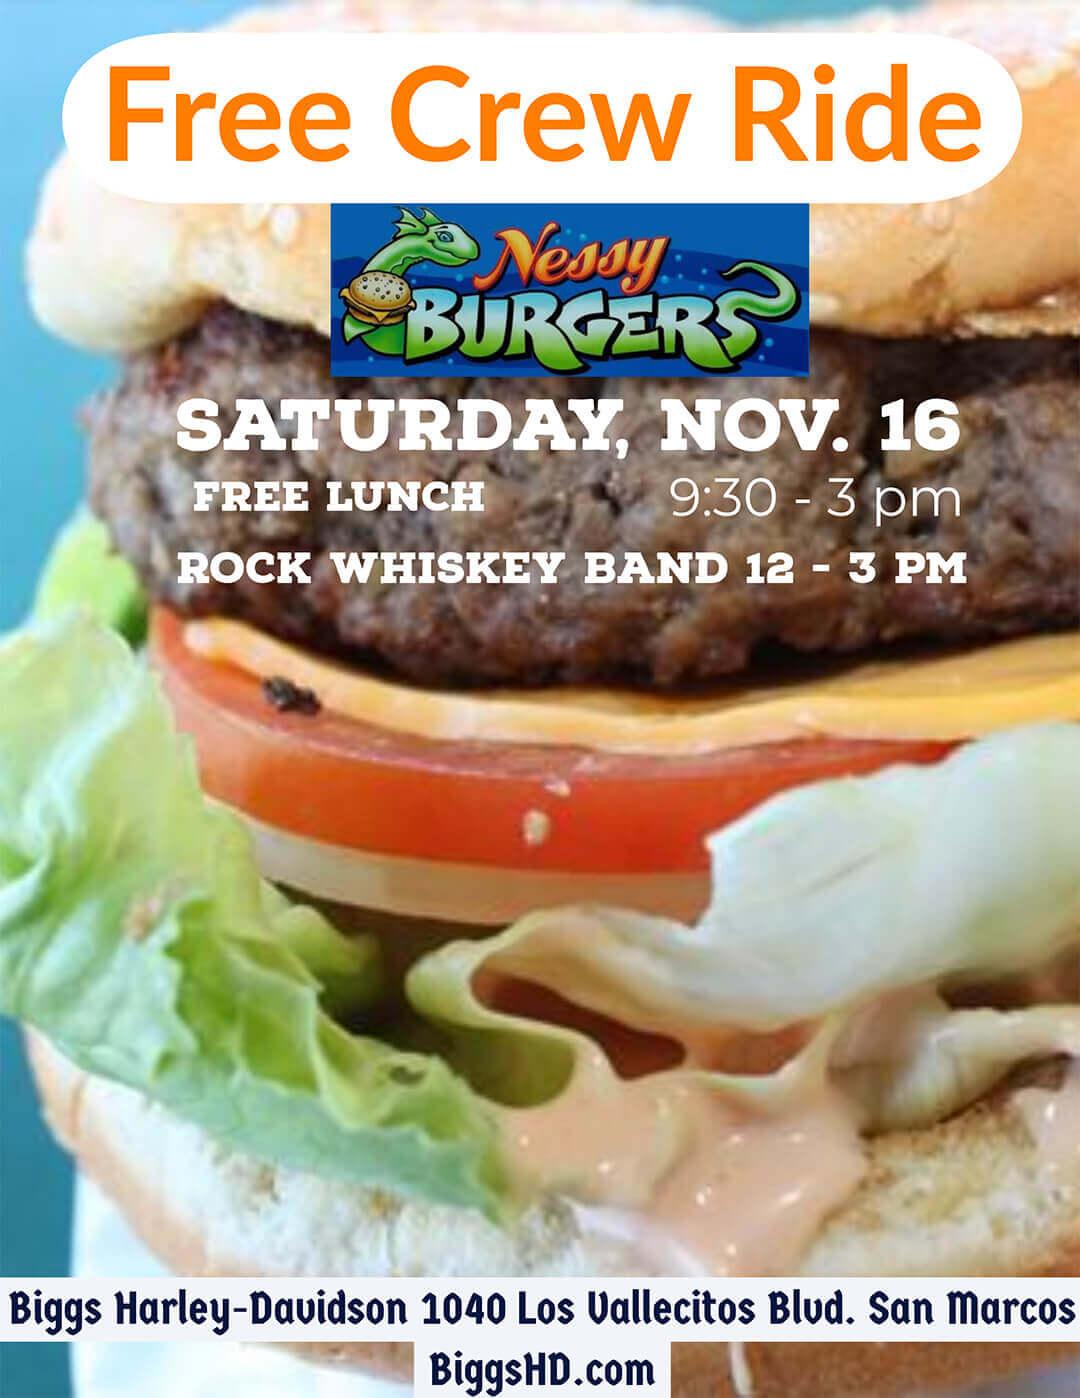 Free Crew Ride Nessy Burgers